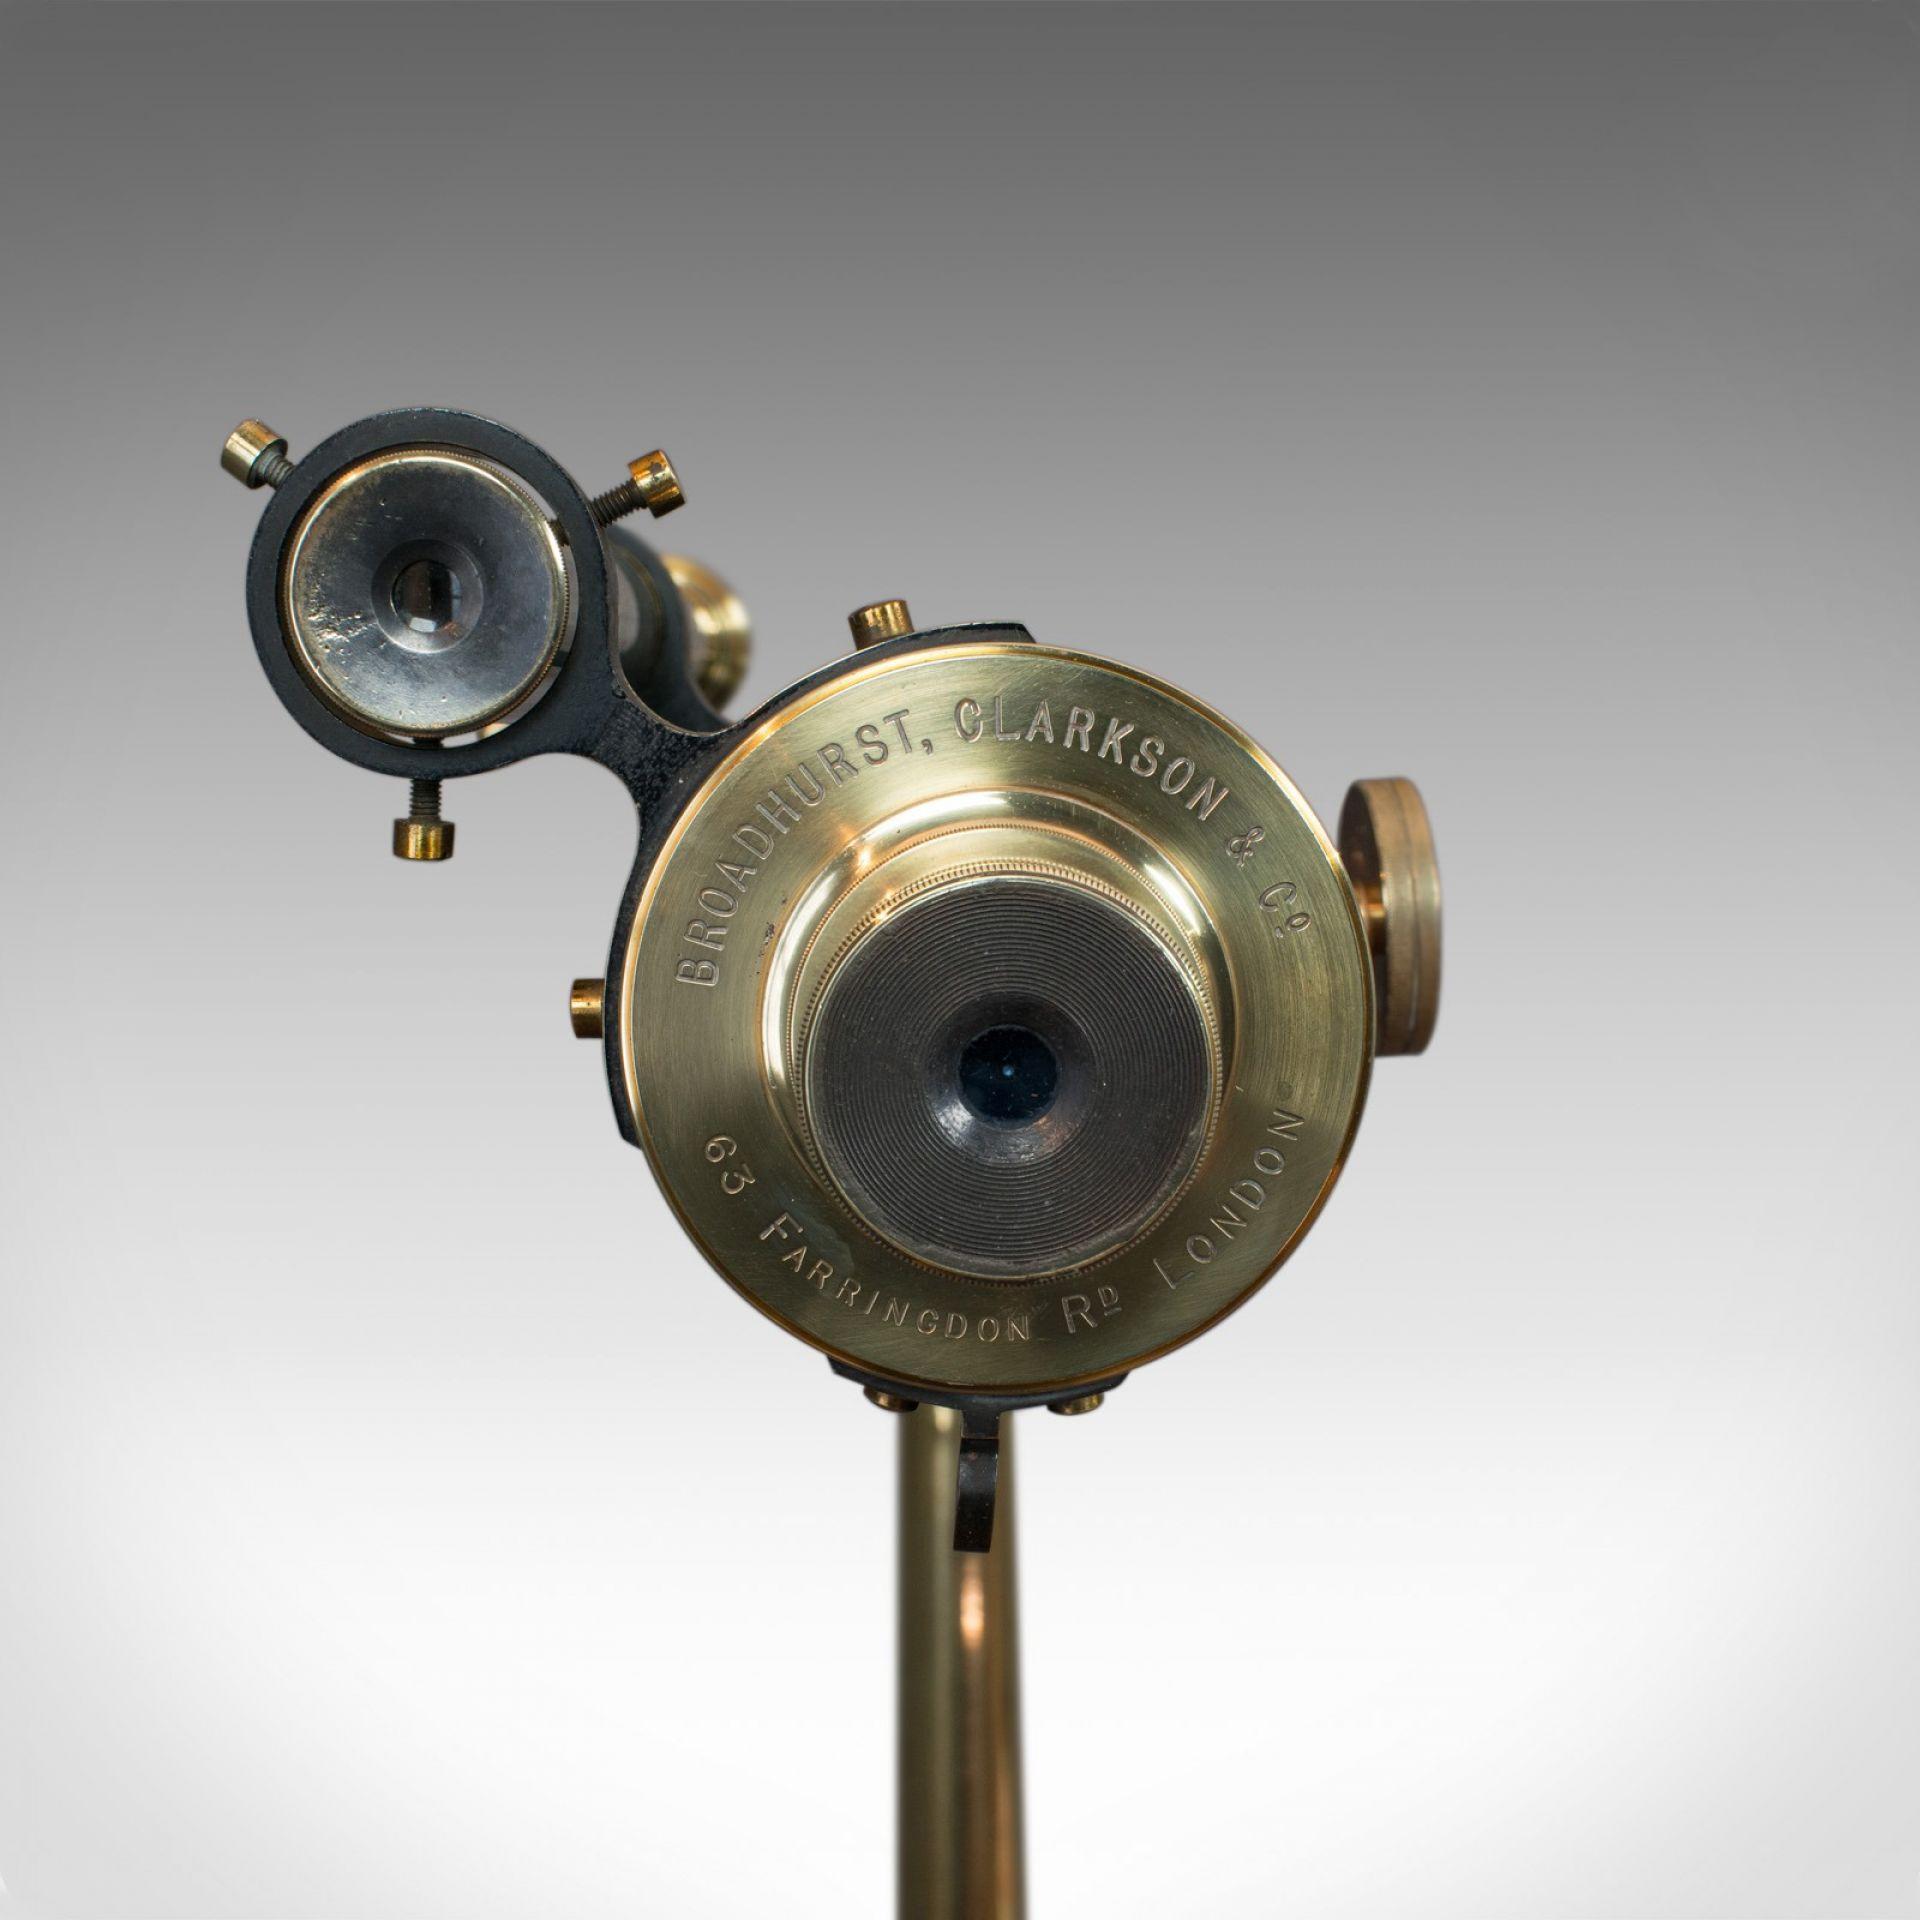 Vintage Telescope, Tripod, Broadhurst Clarkson, London, Starboy, Astronomical